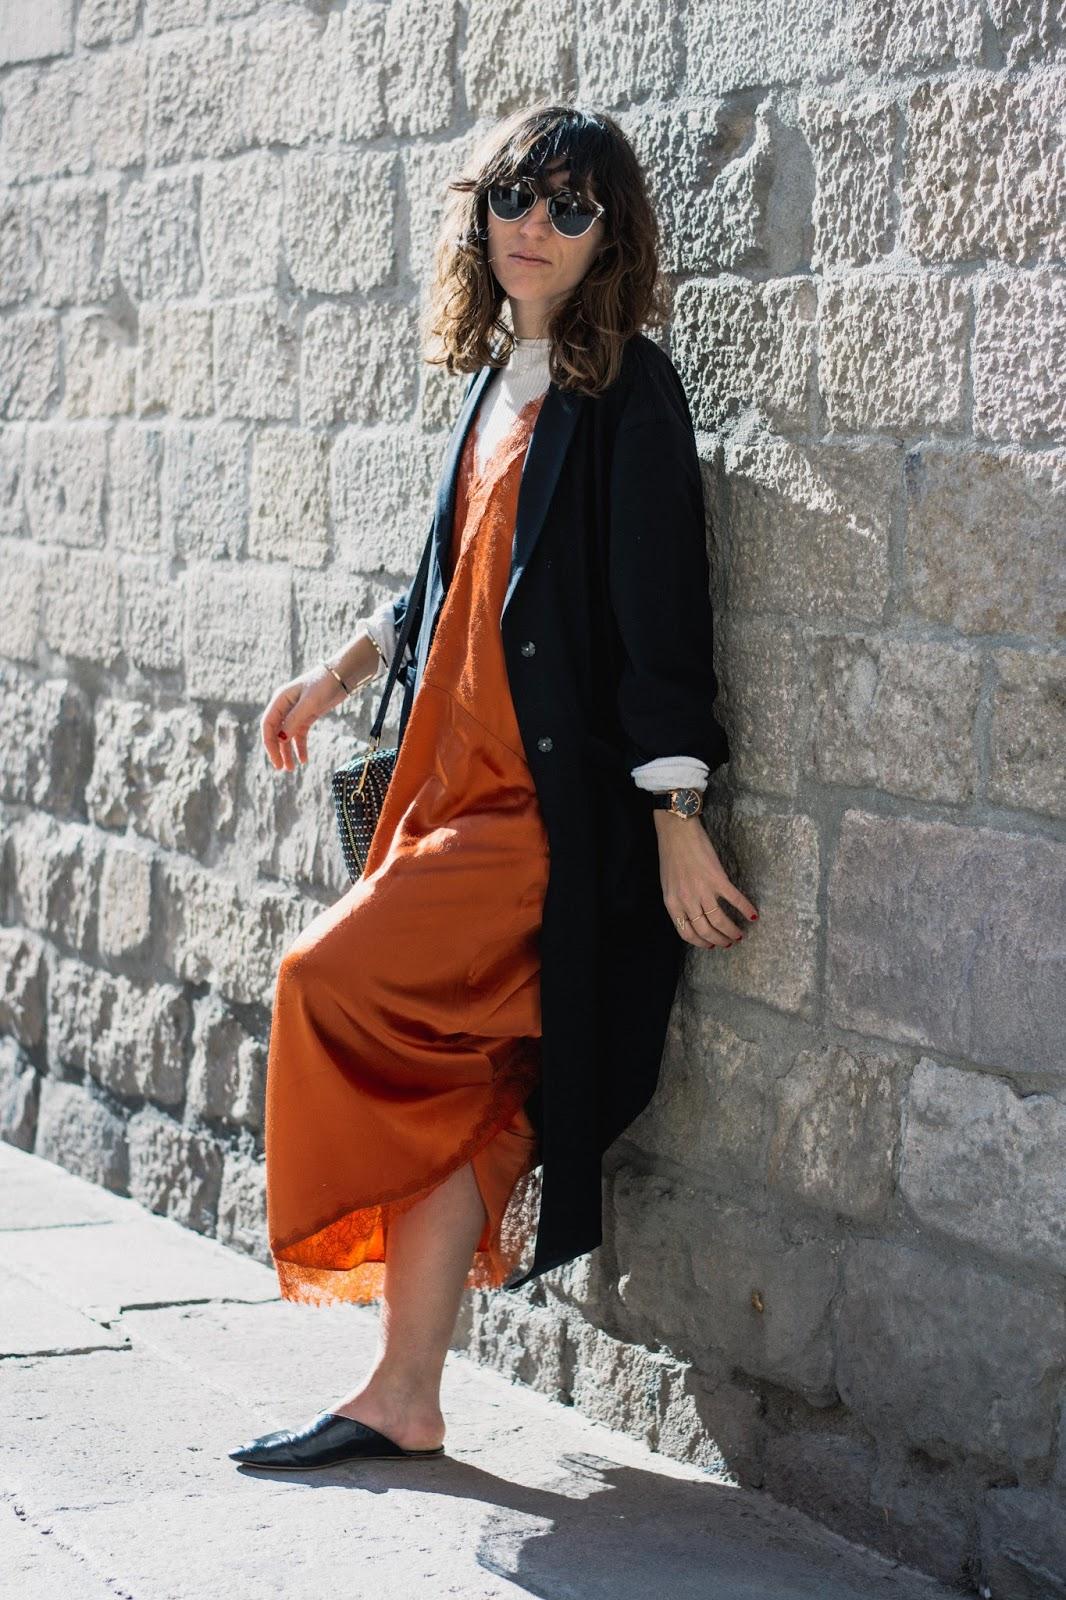 Vestido H&M, babuchas Zara, bolso Bimba y Lola